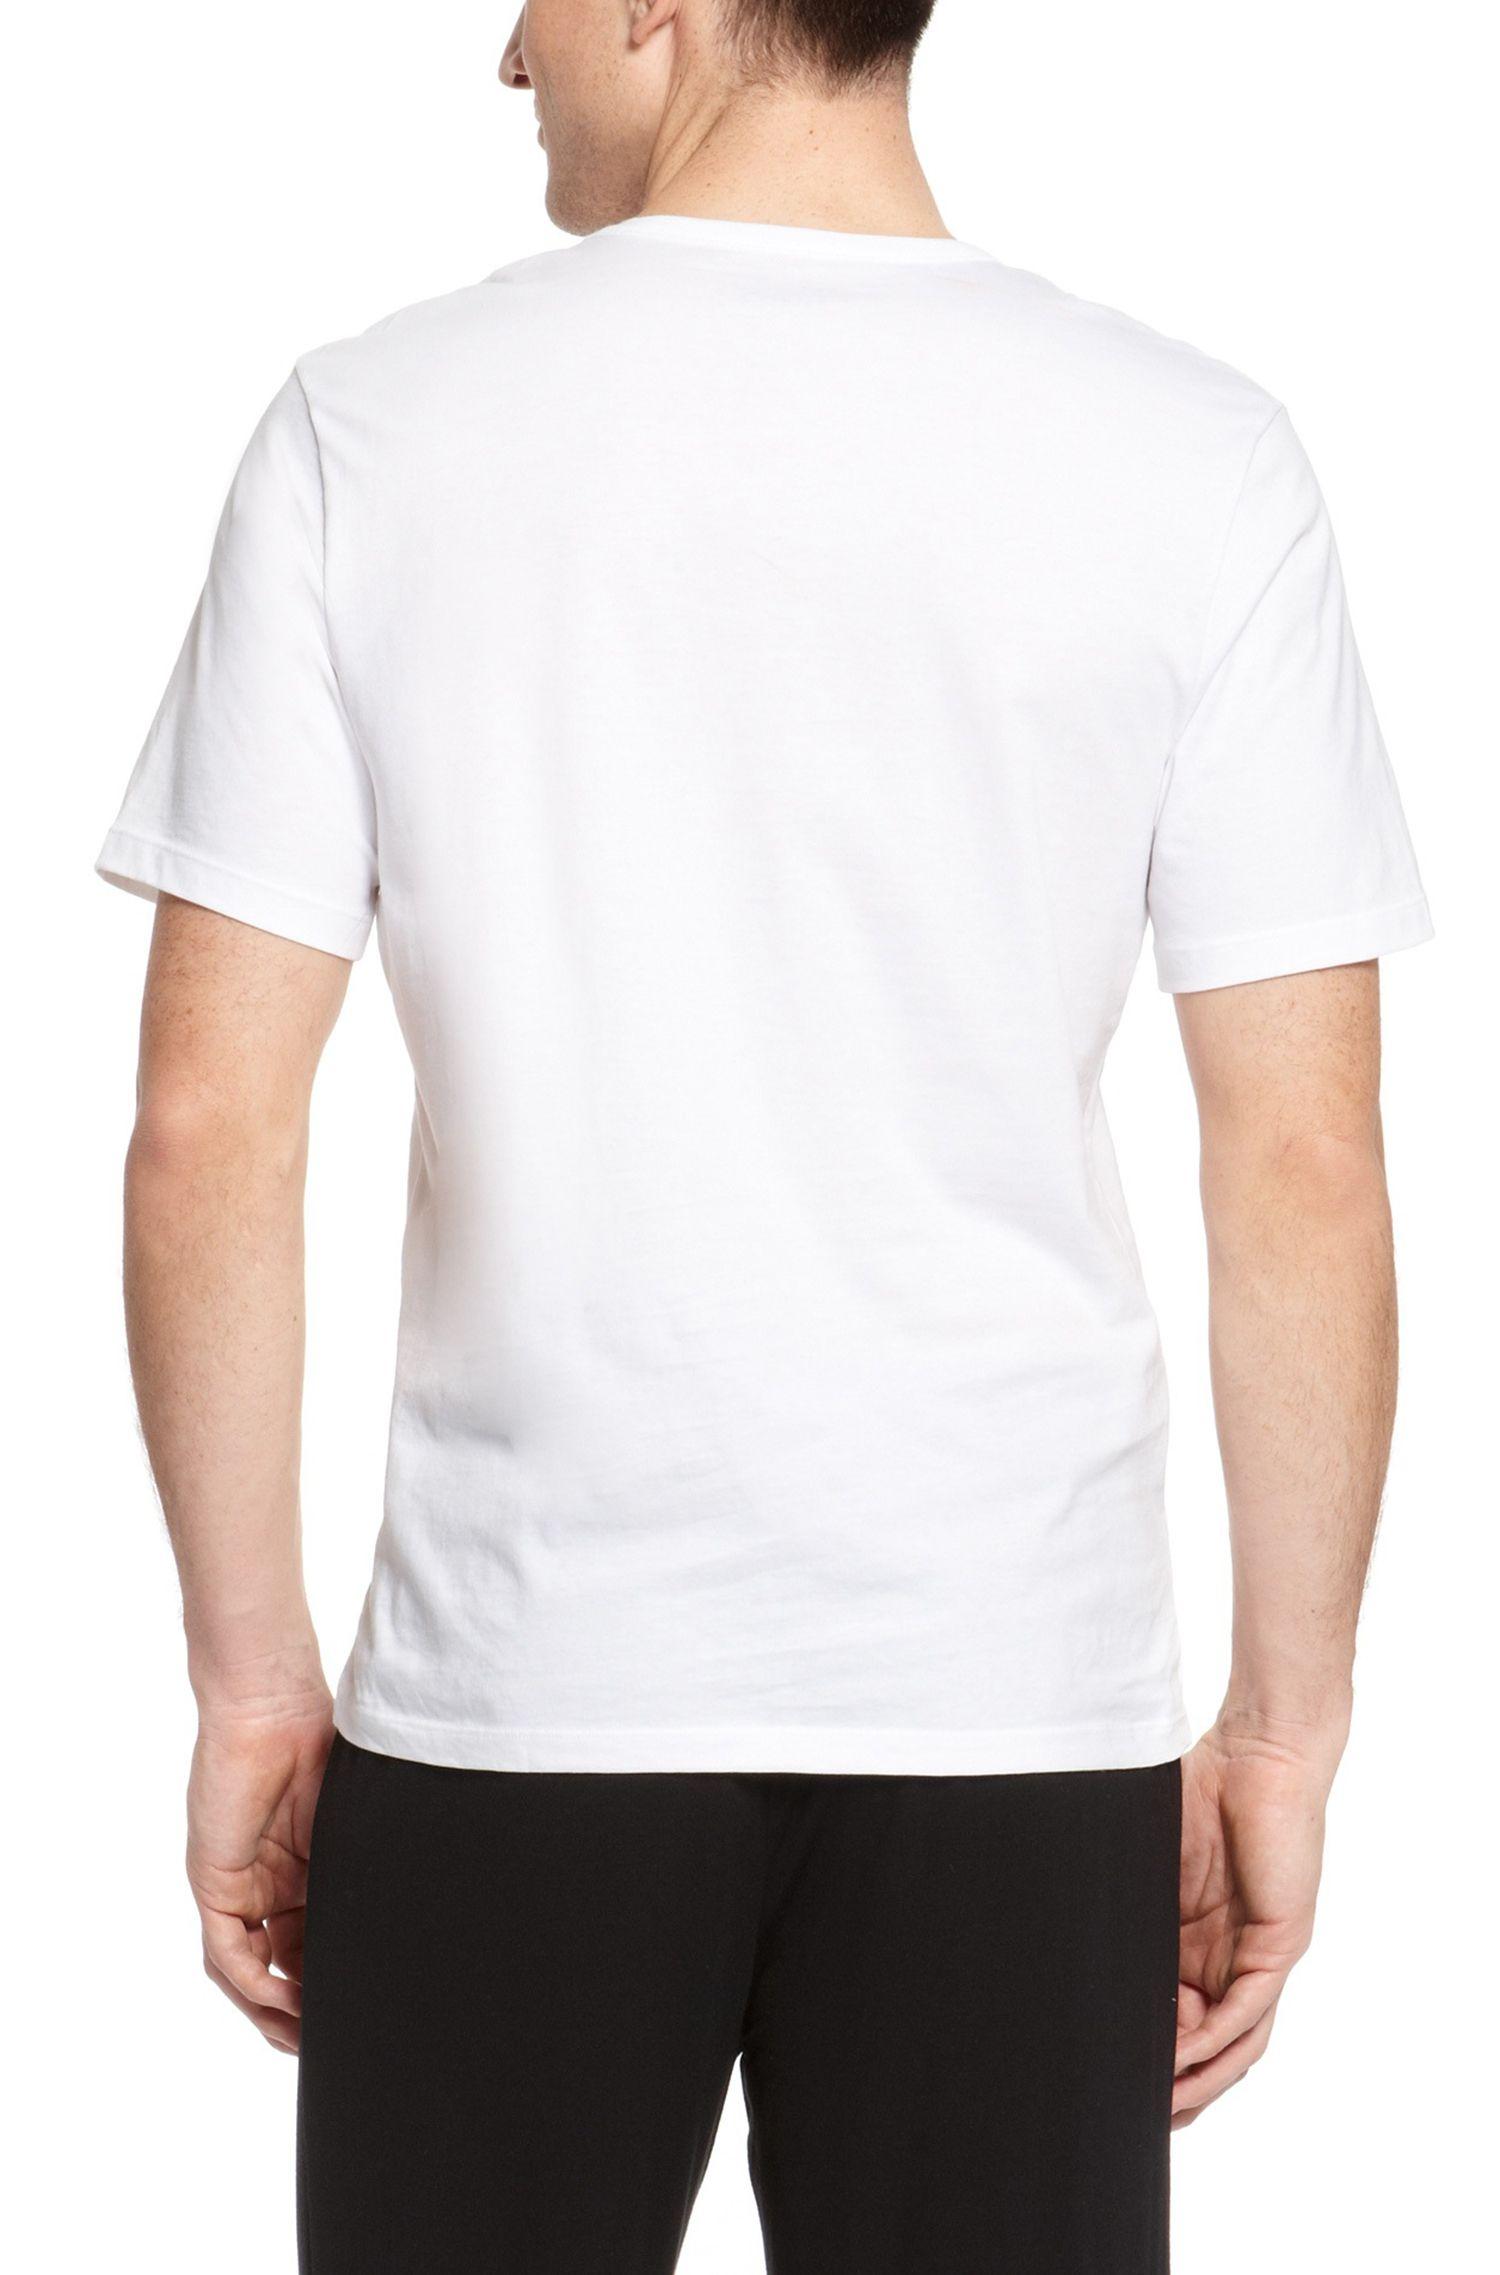 'Shirt'   Cotton V-Neck Undershirt, 3-Pack, White